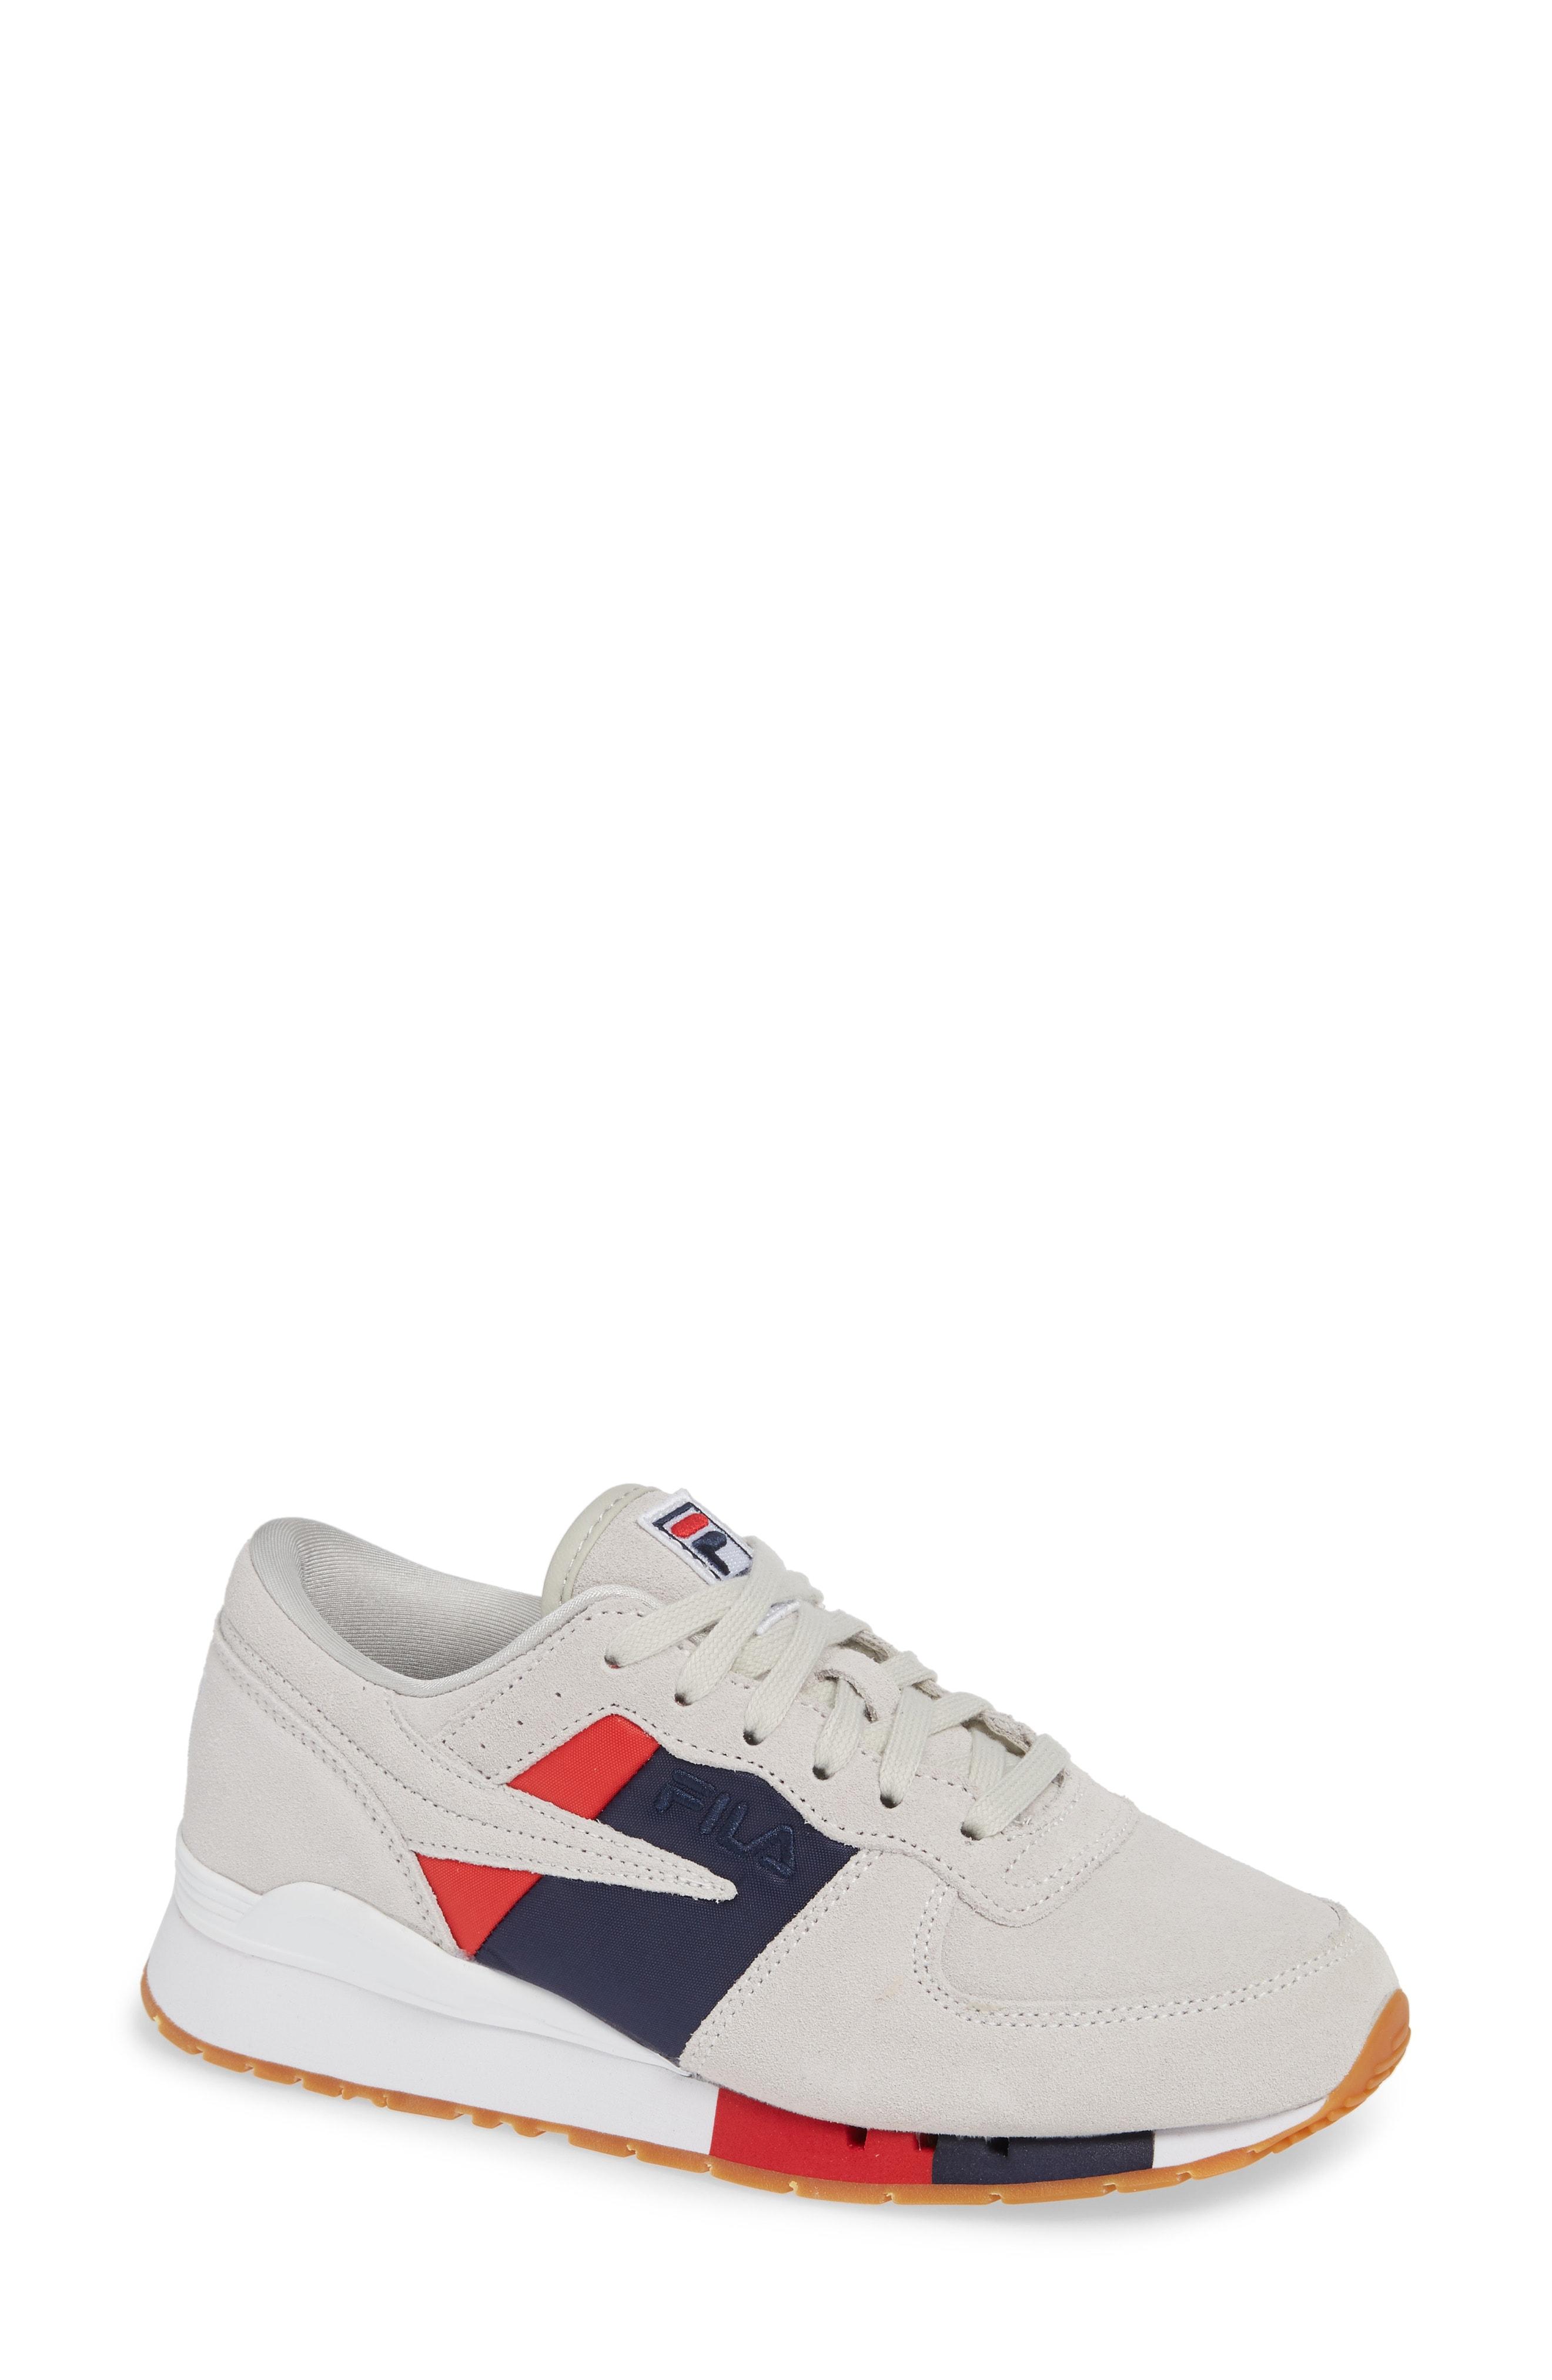 FILA Original Running Chiara Sneaker (Women)